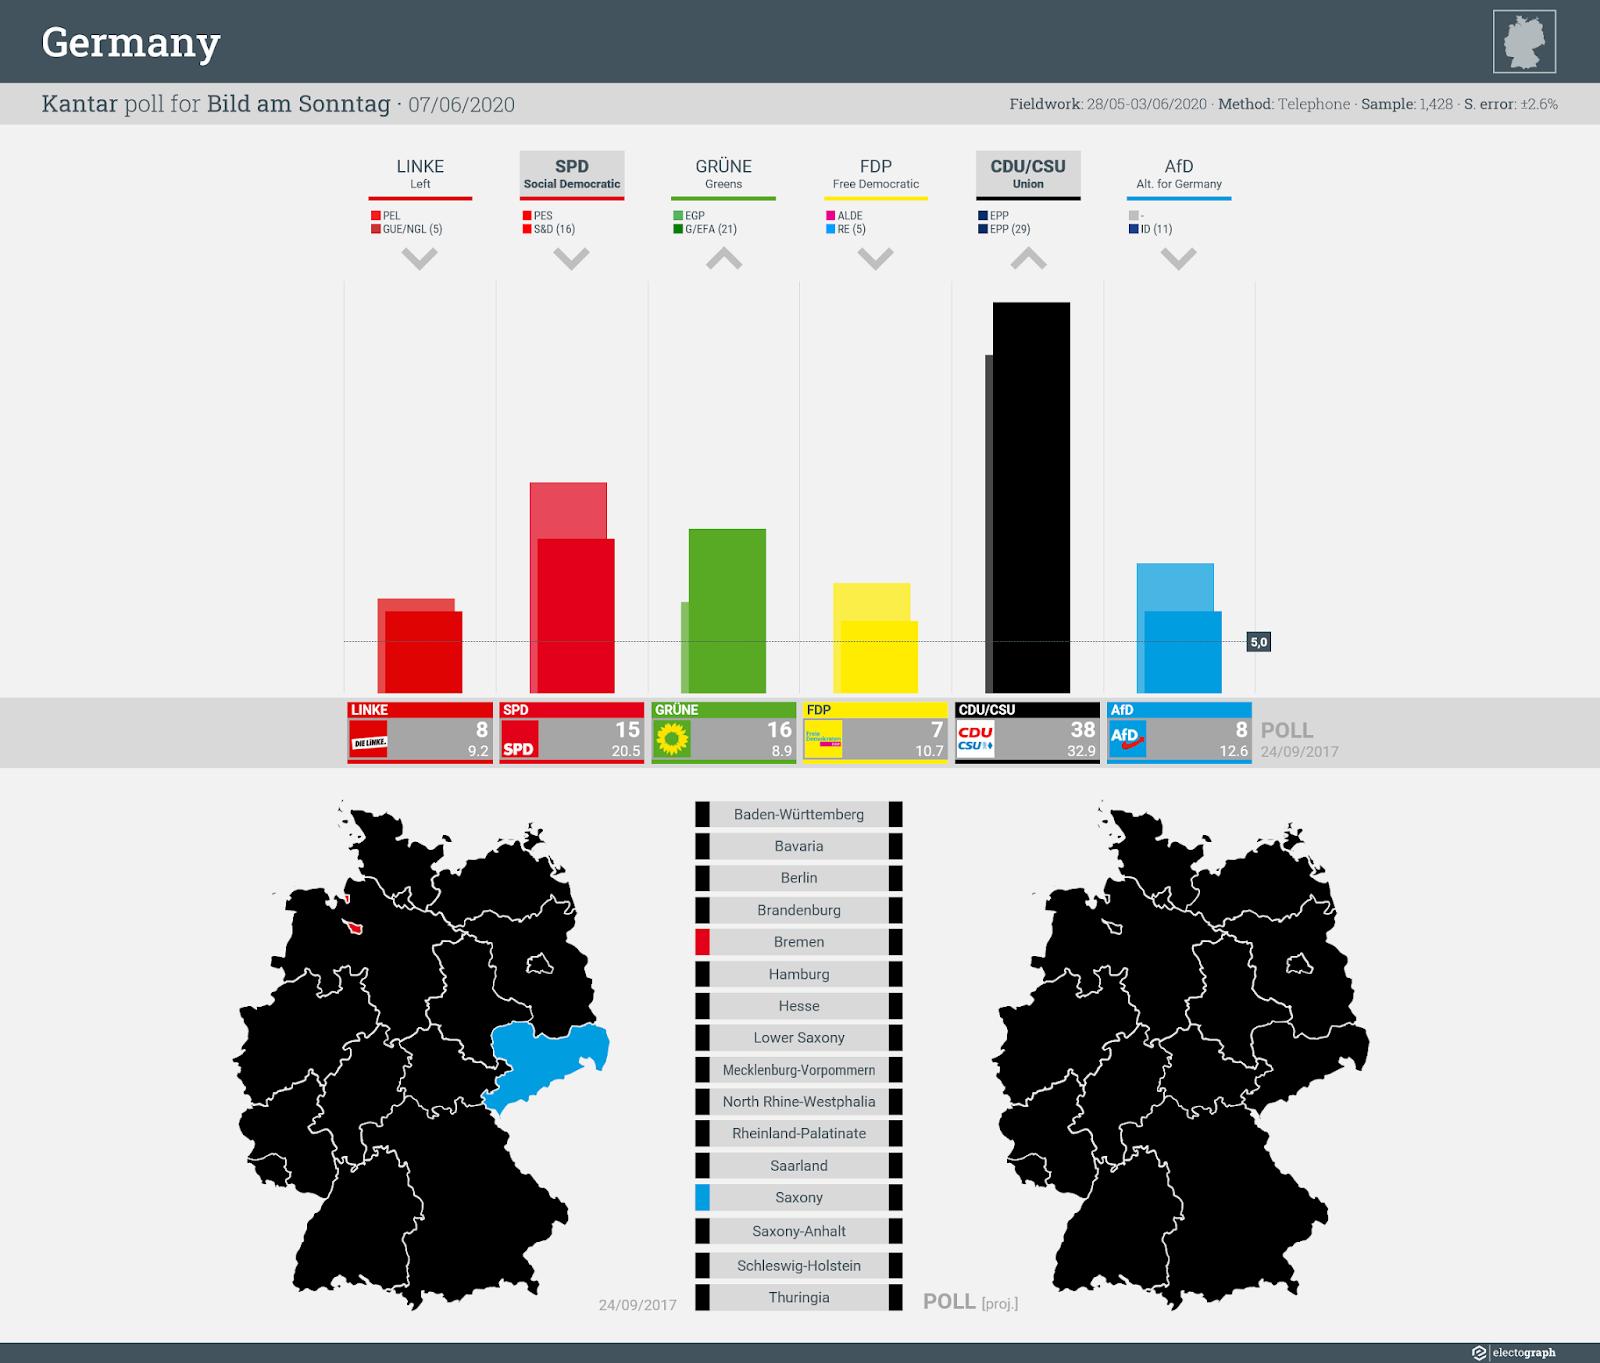 GERMANY: Kantar poll chart for Bild am Sonntag, 7 June 2020